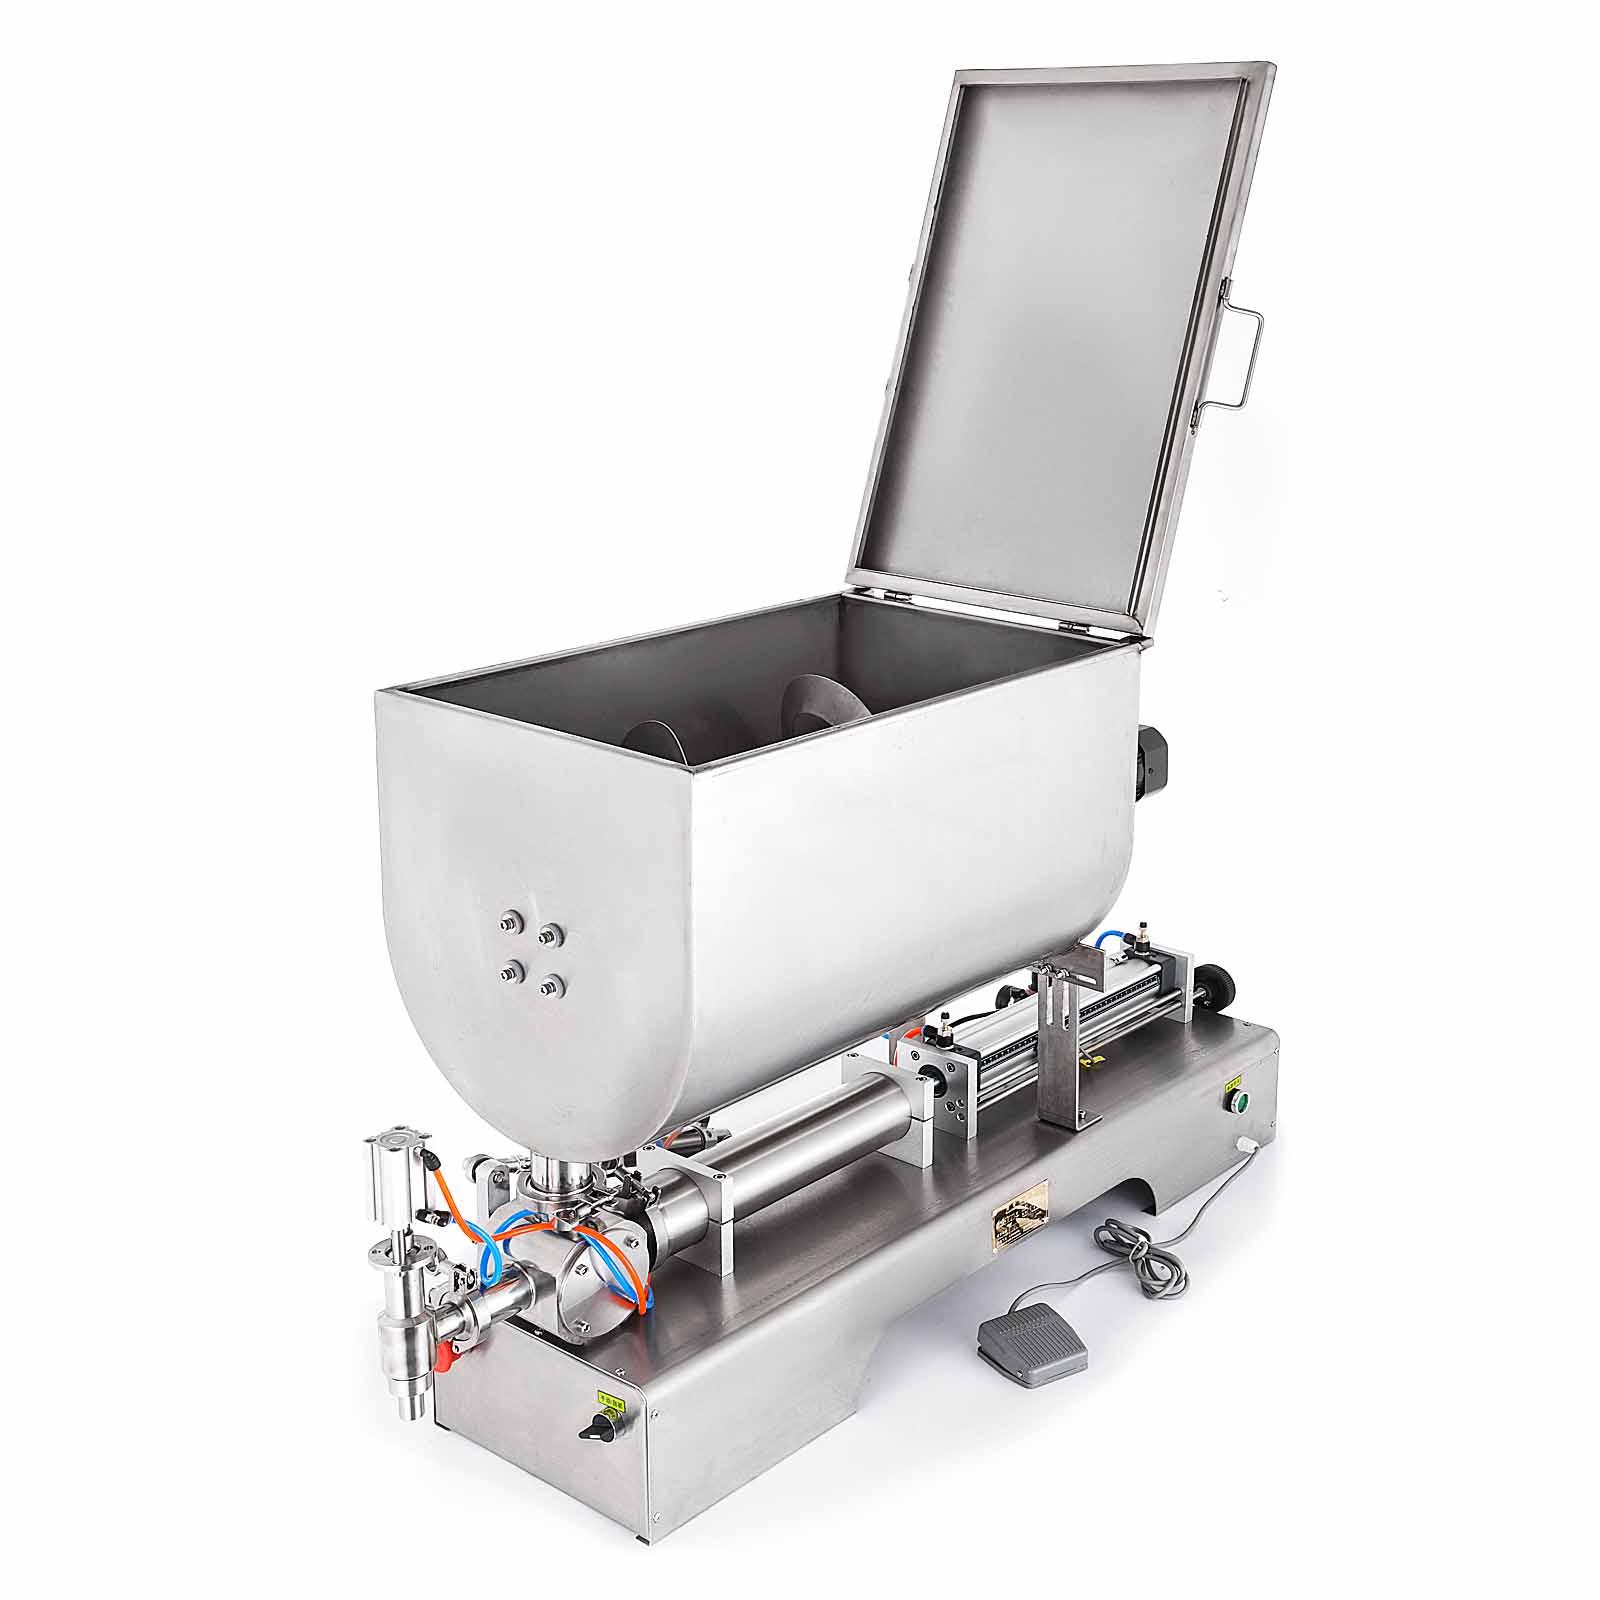 Liquid-Filling-Machine-Filler-Remplissage-2-3500ML-50-500ML-INDUSTRY-SUPPLY miniature 89